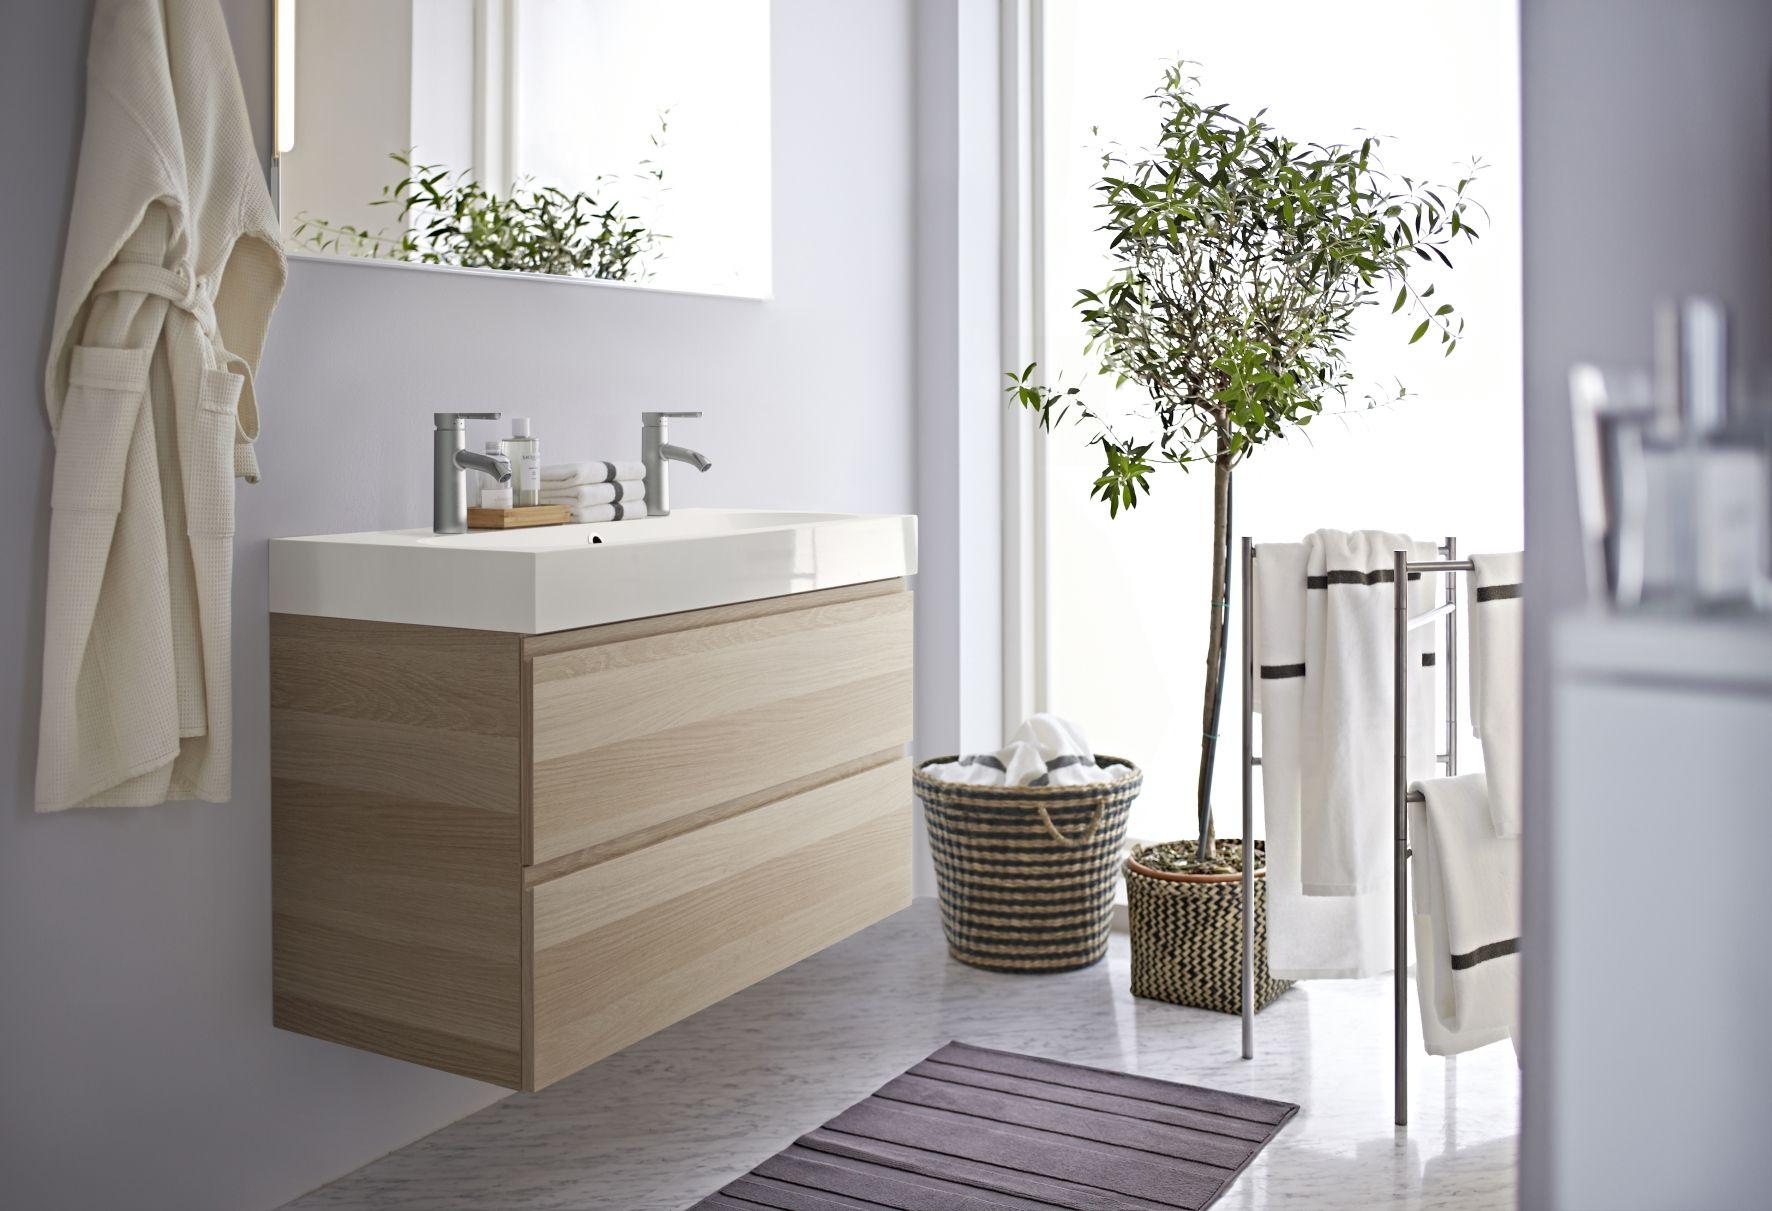 Ikea Badkamer Design : Godmorgon wastafelkast ikea badkamer opberger badkamer